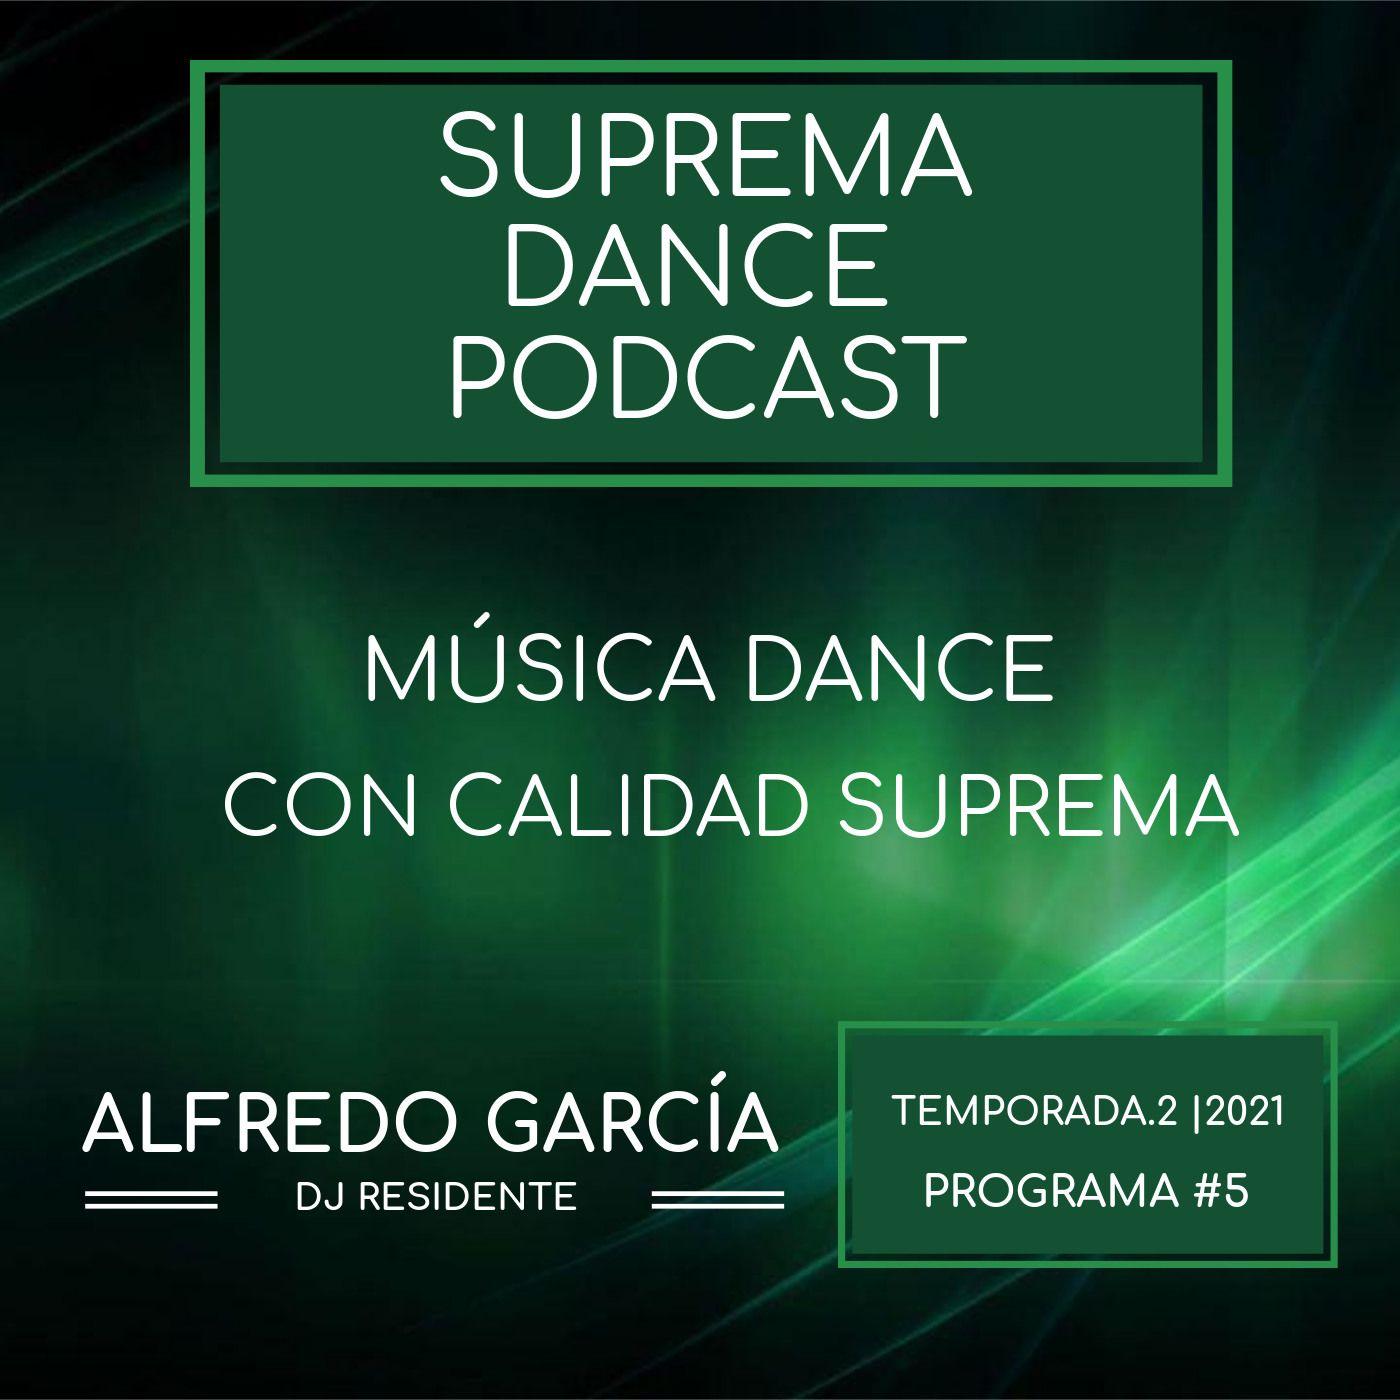 DJ Residente Alfredo García | Programa-5 | T.2 | SDP